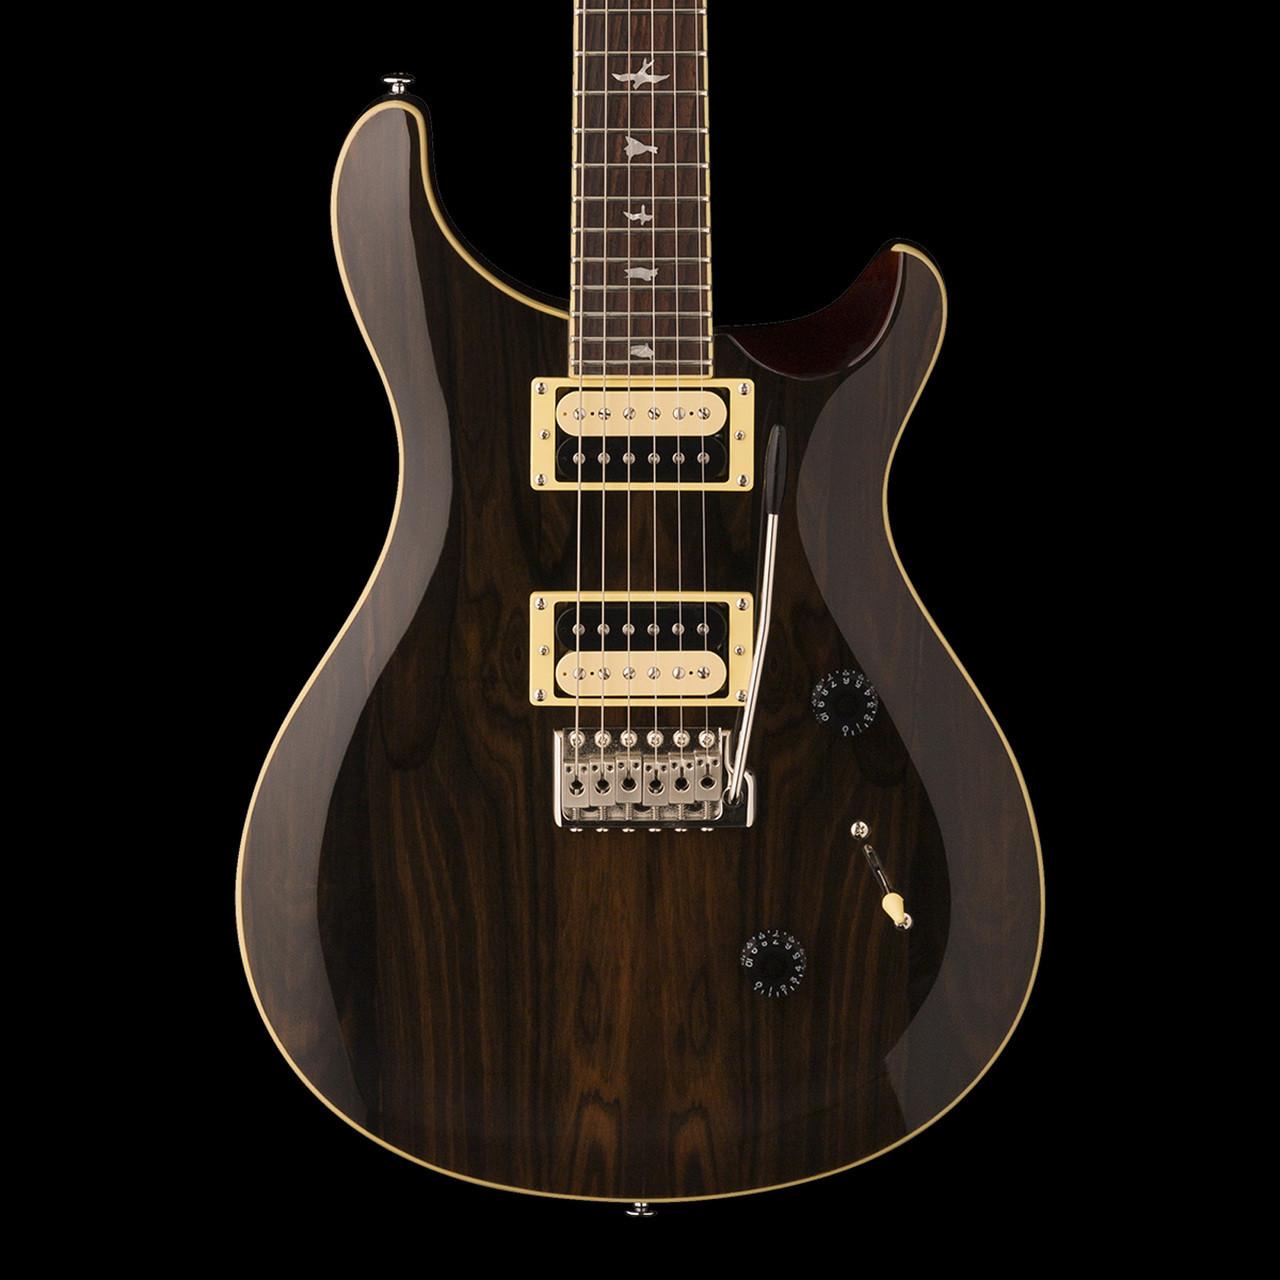 pre order prs 2019 se custom 24 ziricote 899 60 deposit moore guitars. Black Bedroom Furniture Sets. Home Design Ideas